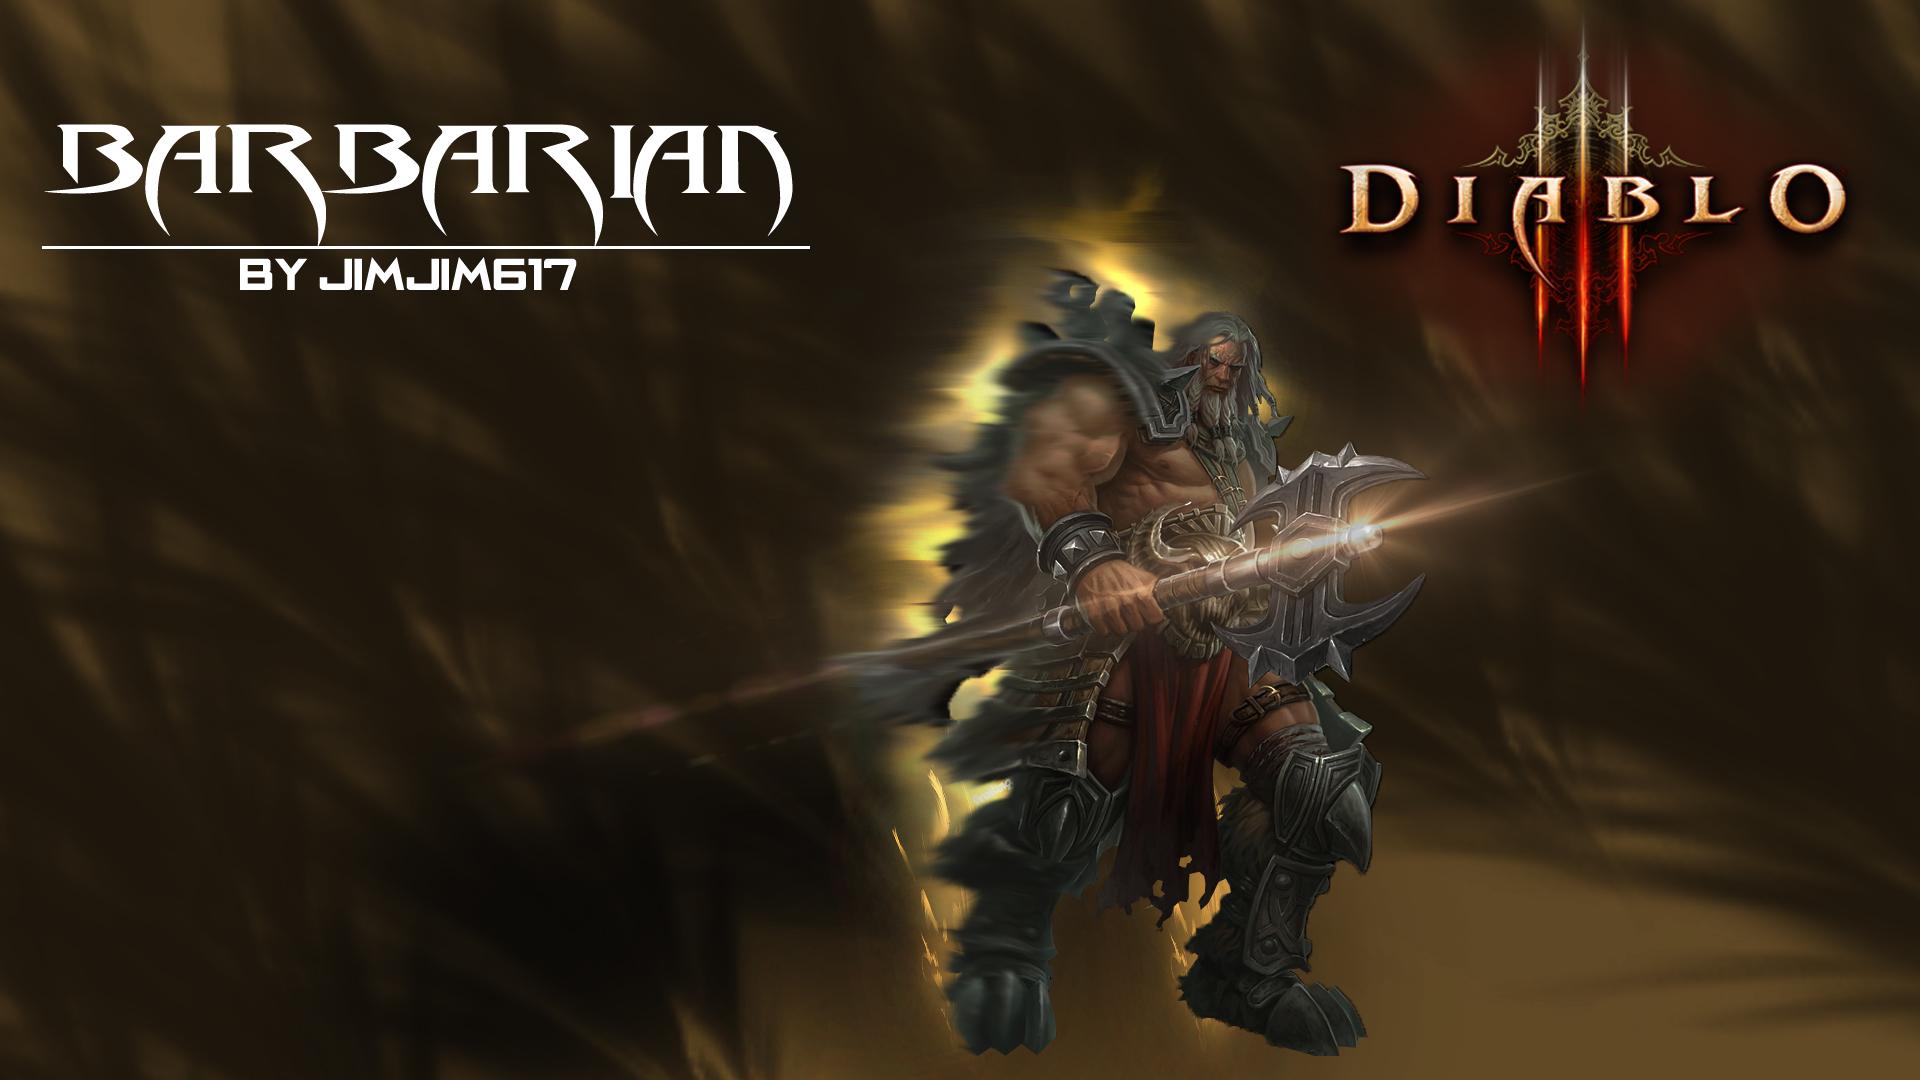 Diablo 3 Barbarian wallpaper   877168 1920x1080